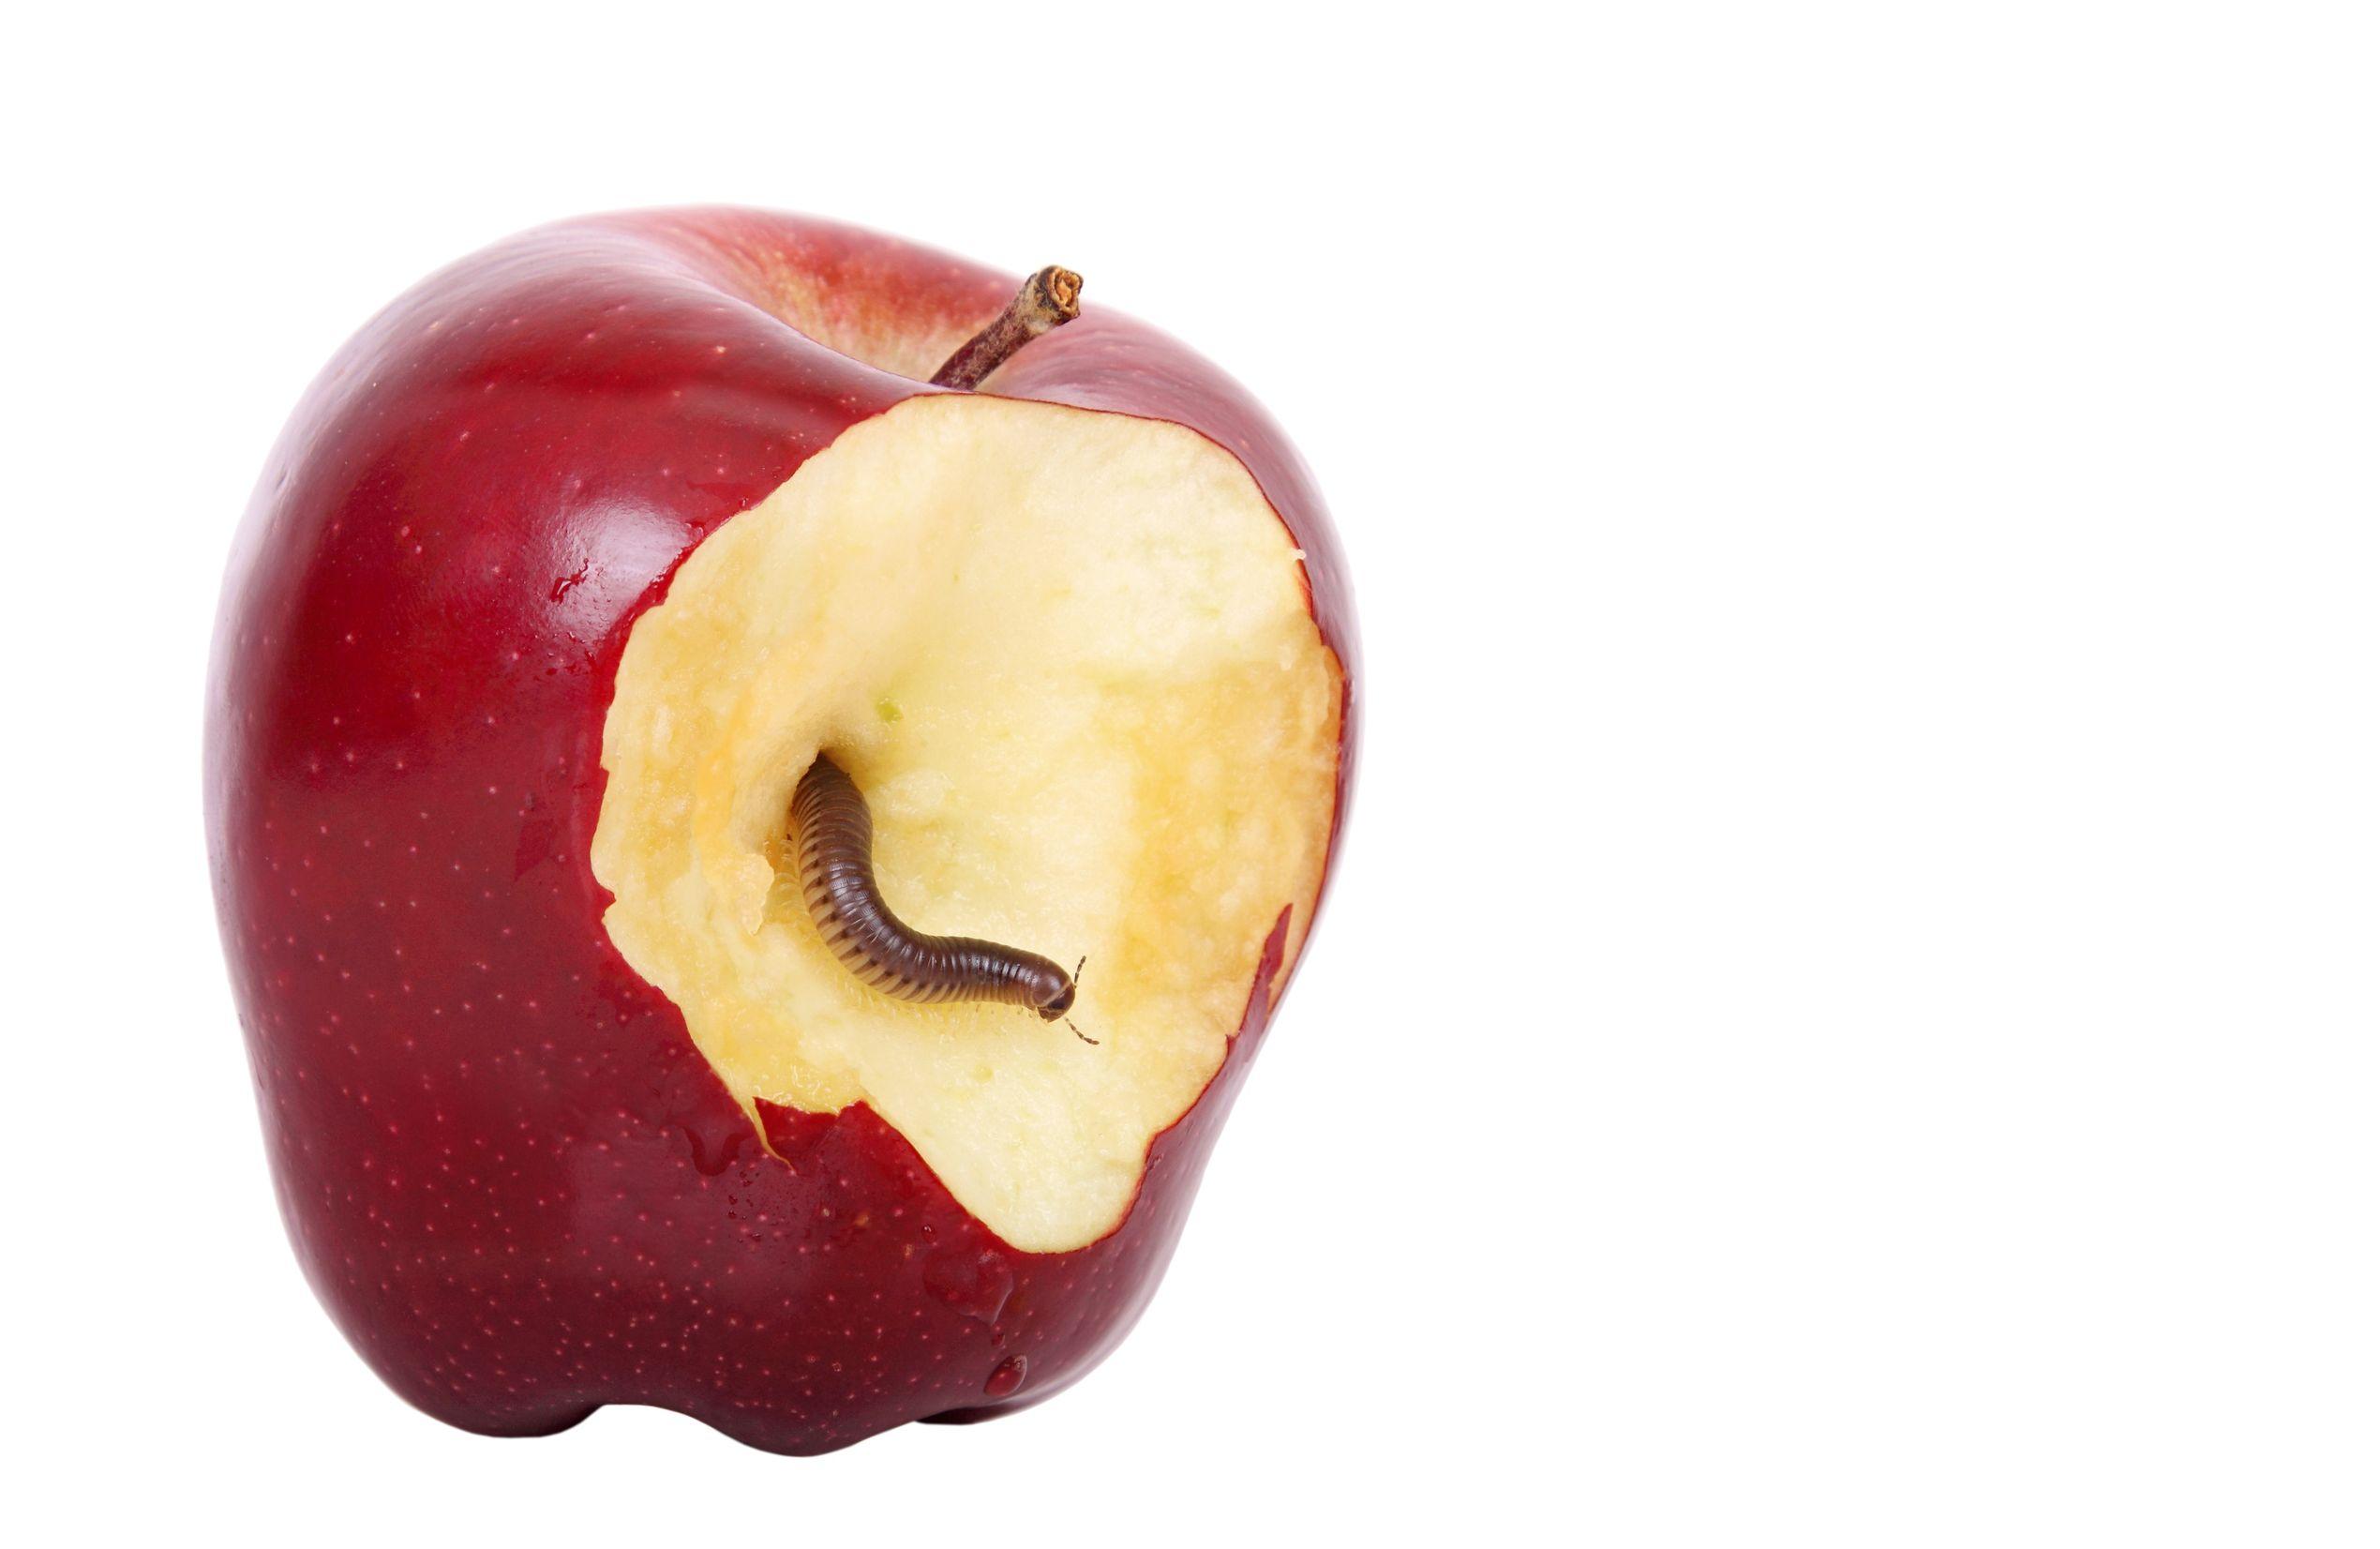 apple n worm